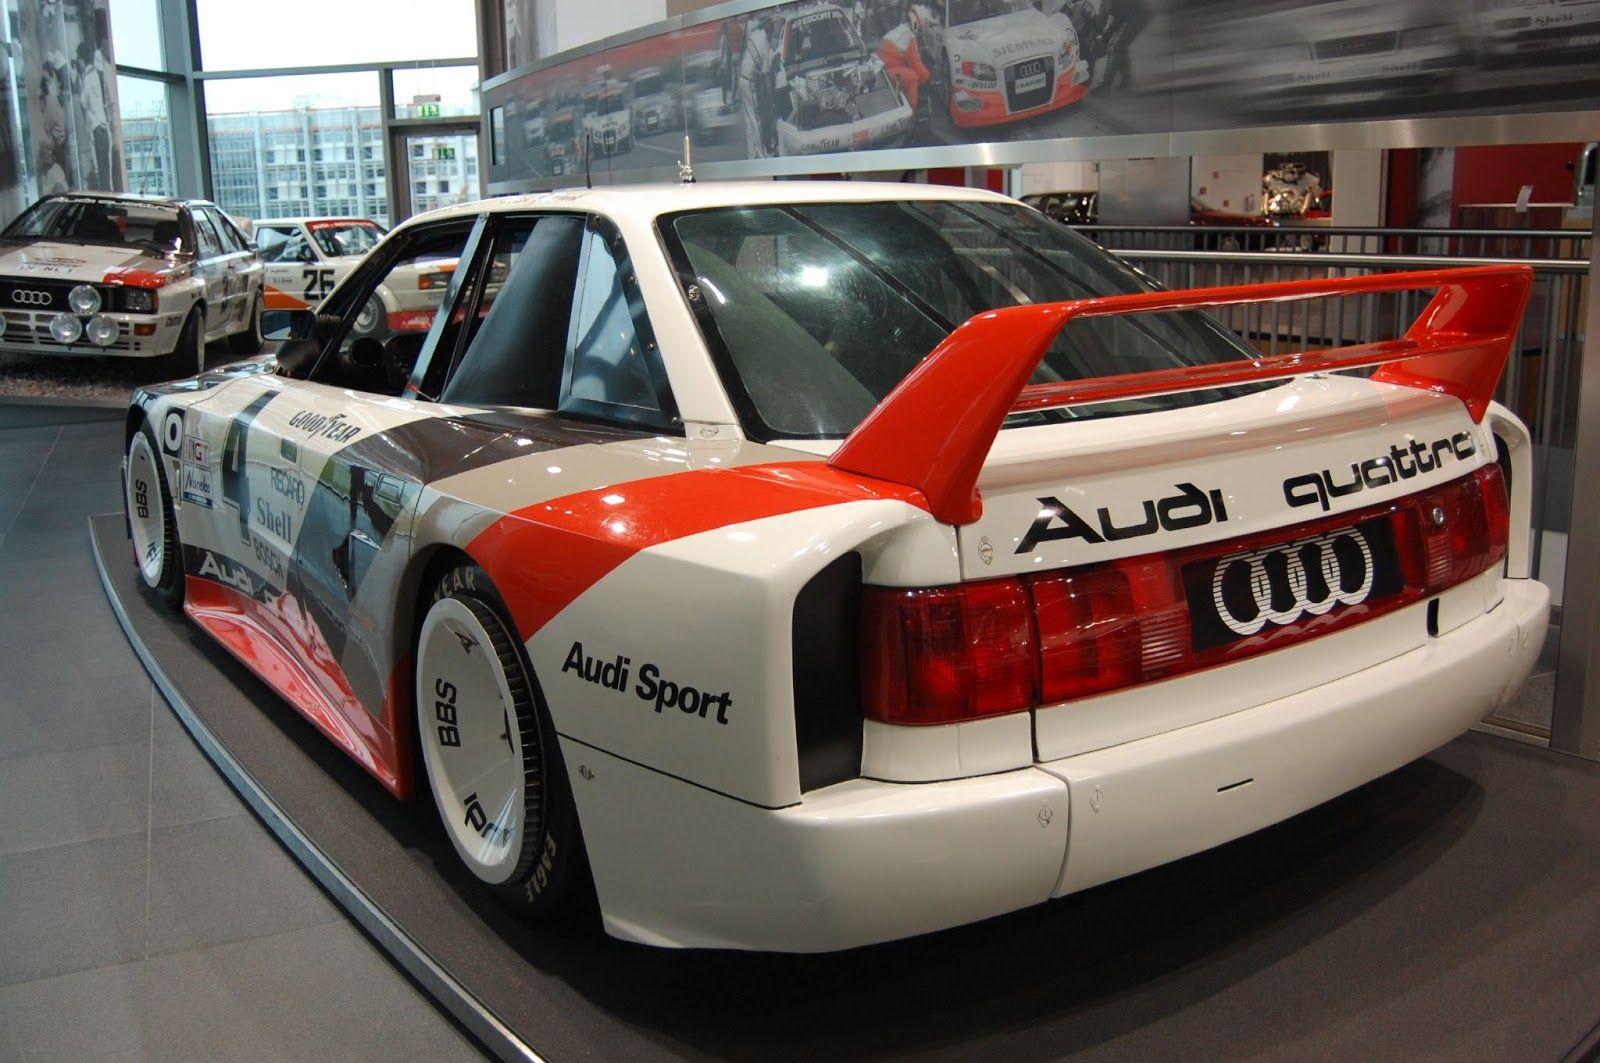 Gorgeous Audi 90. Look at those rims.